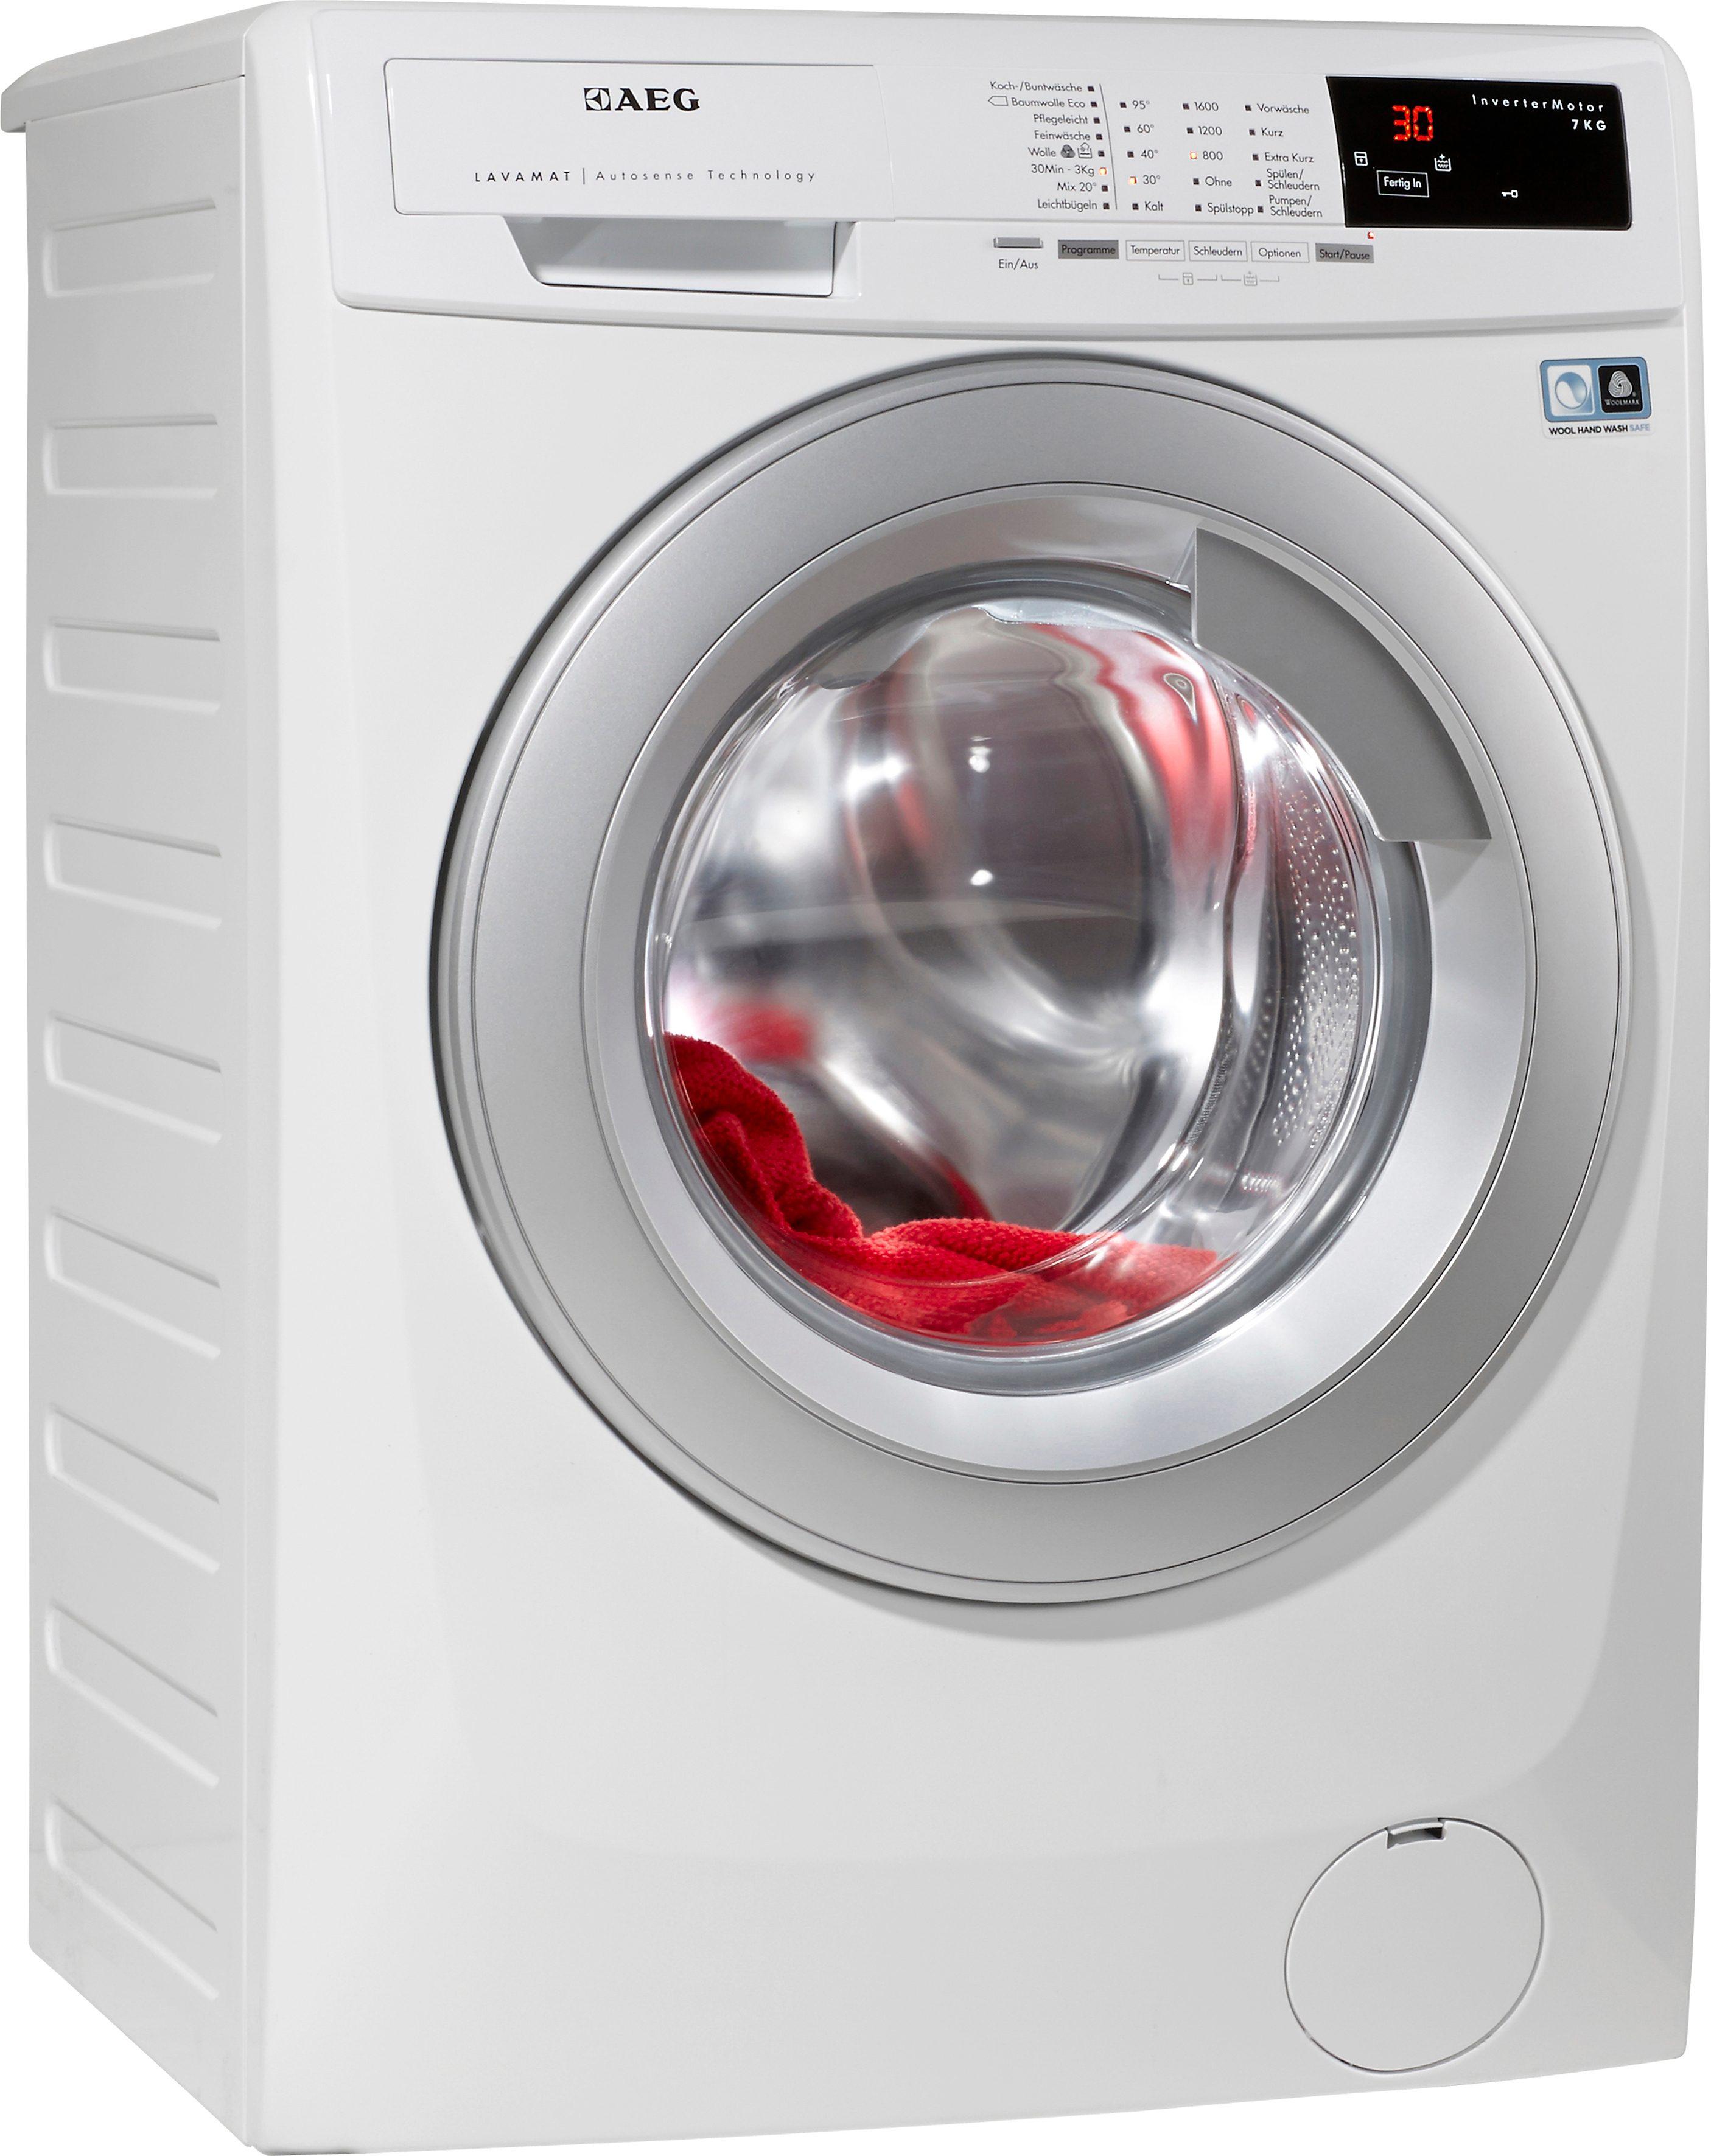 AEG Waschmaschine LAVAMAT L16AS7, A+++, 7 kg, 1600 U/Min